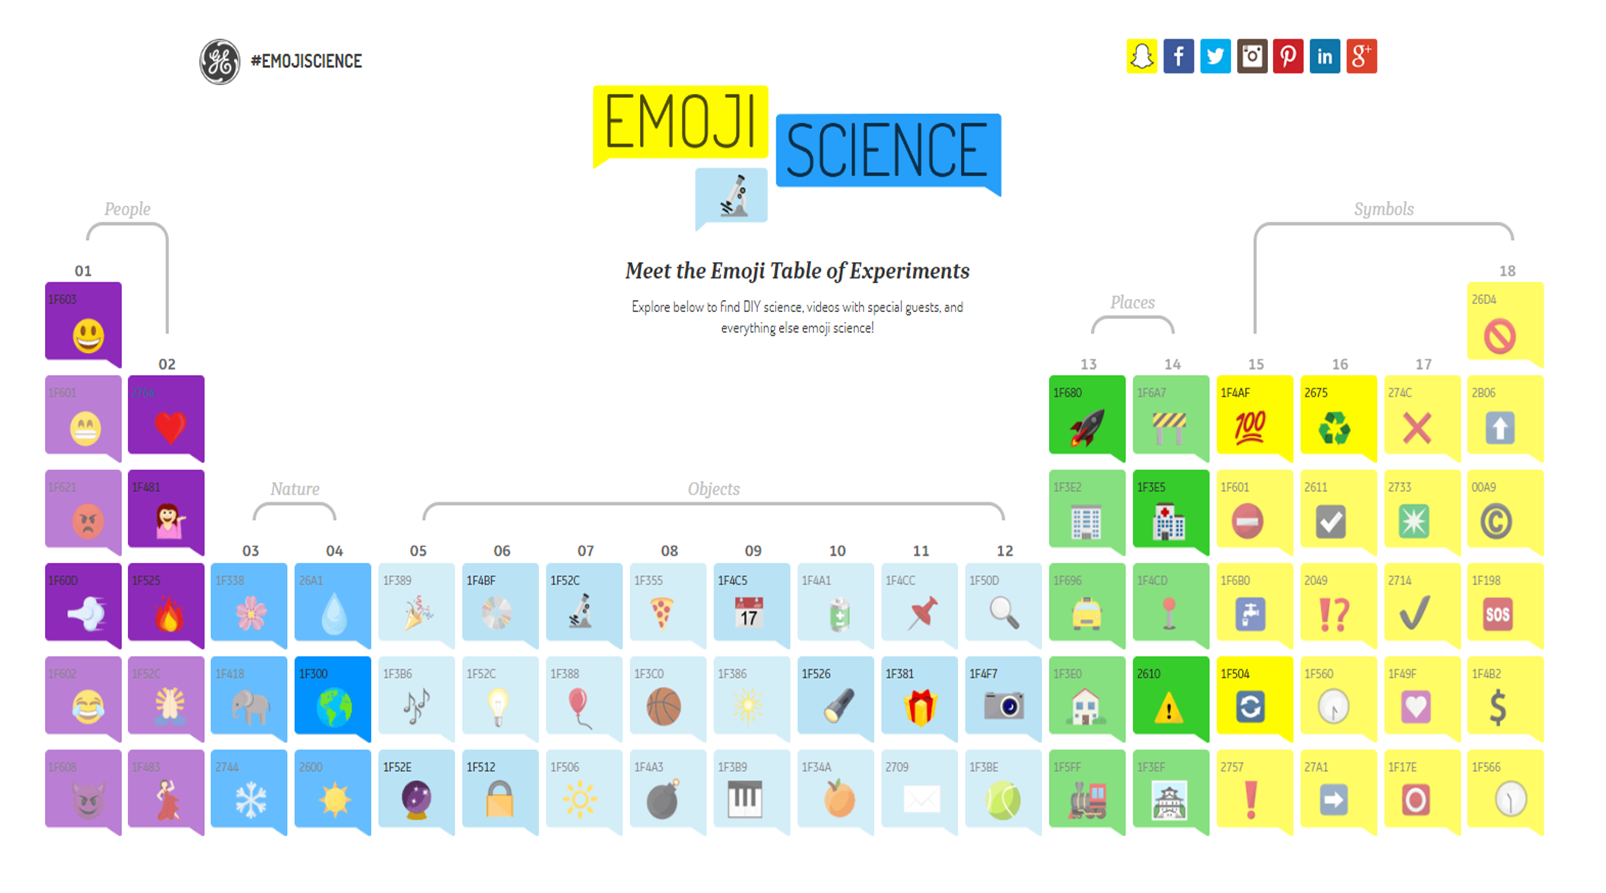 Emoji science general electric tabella elementi